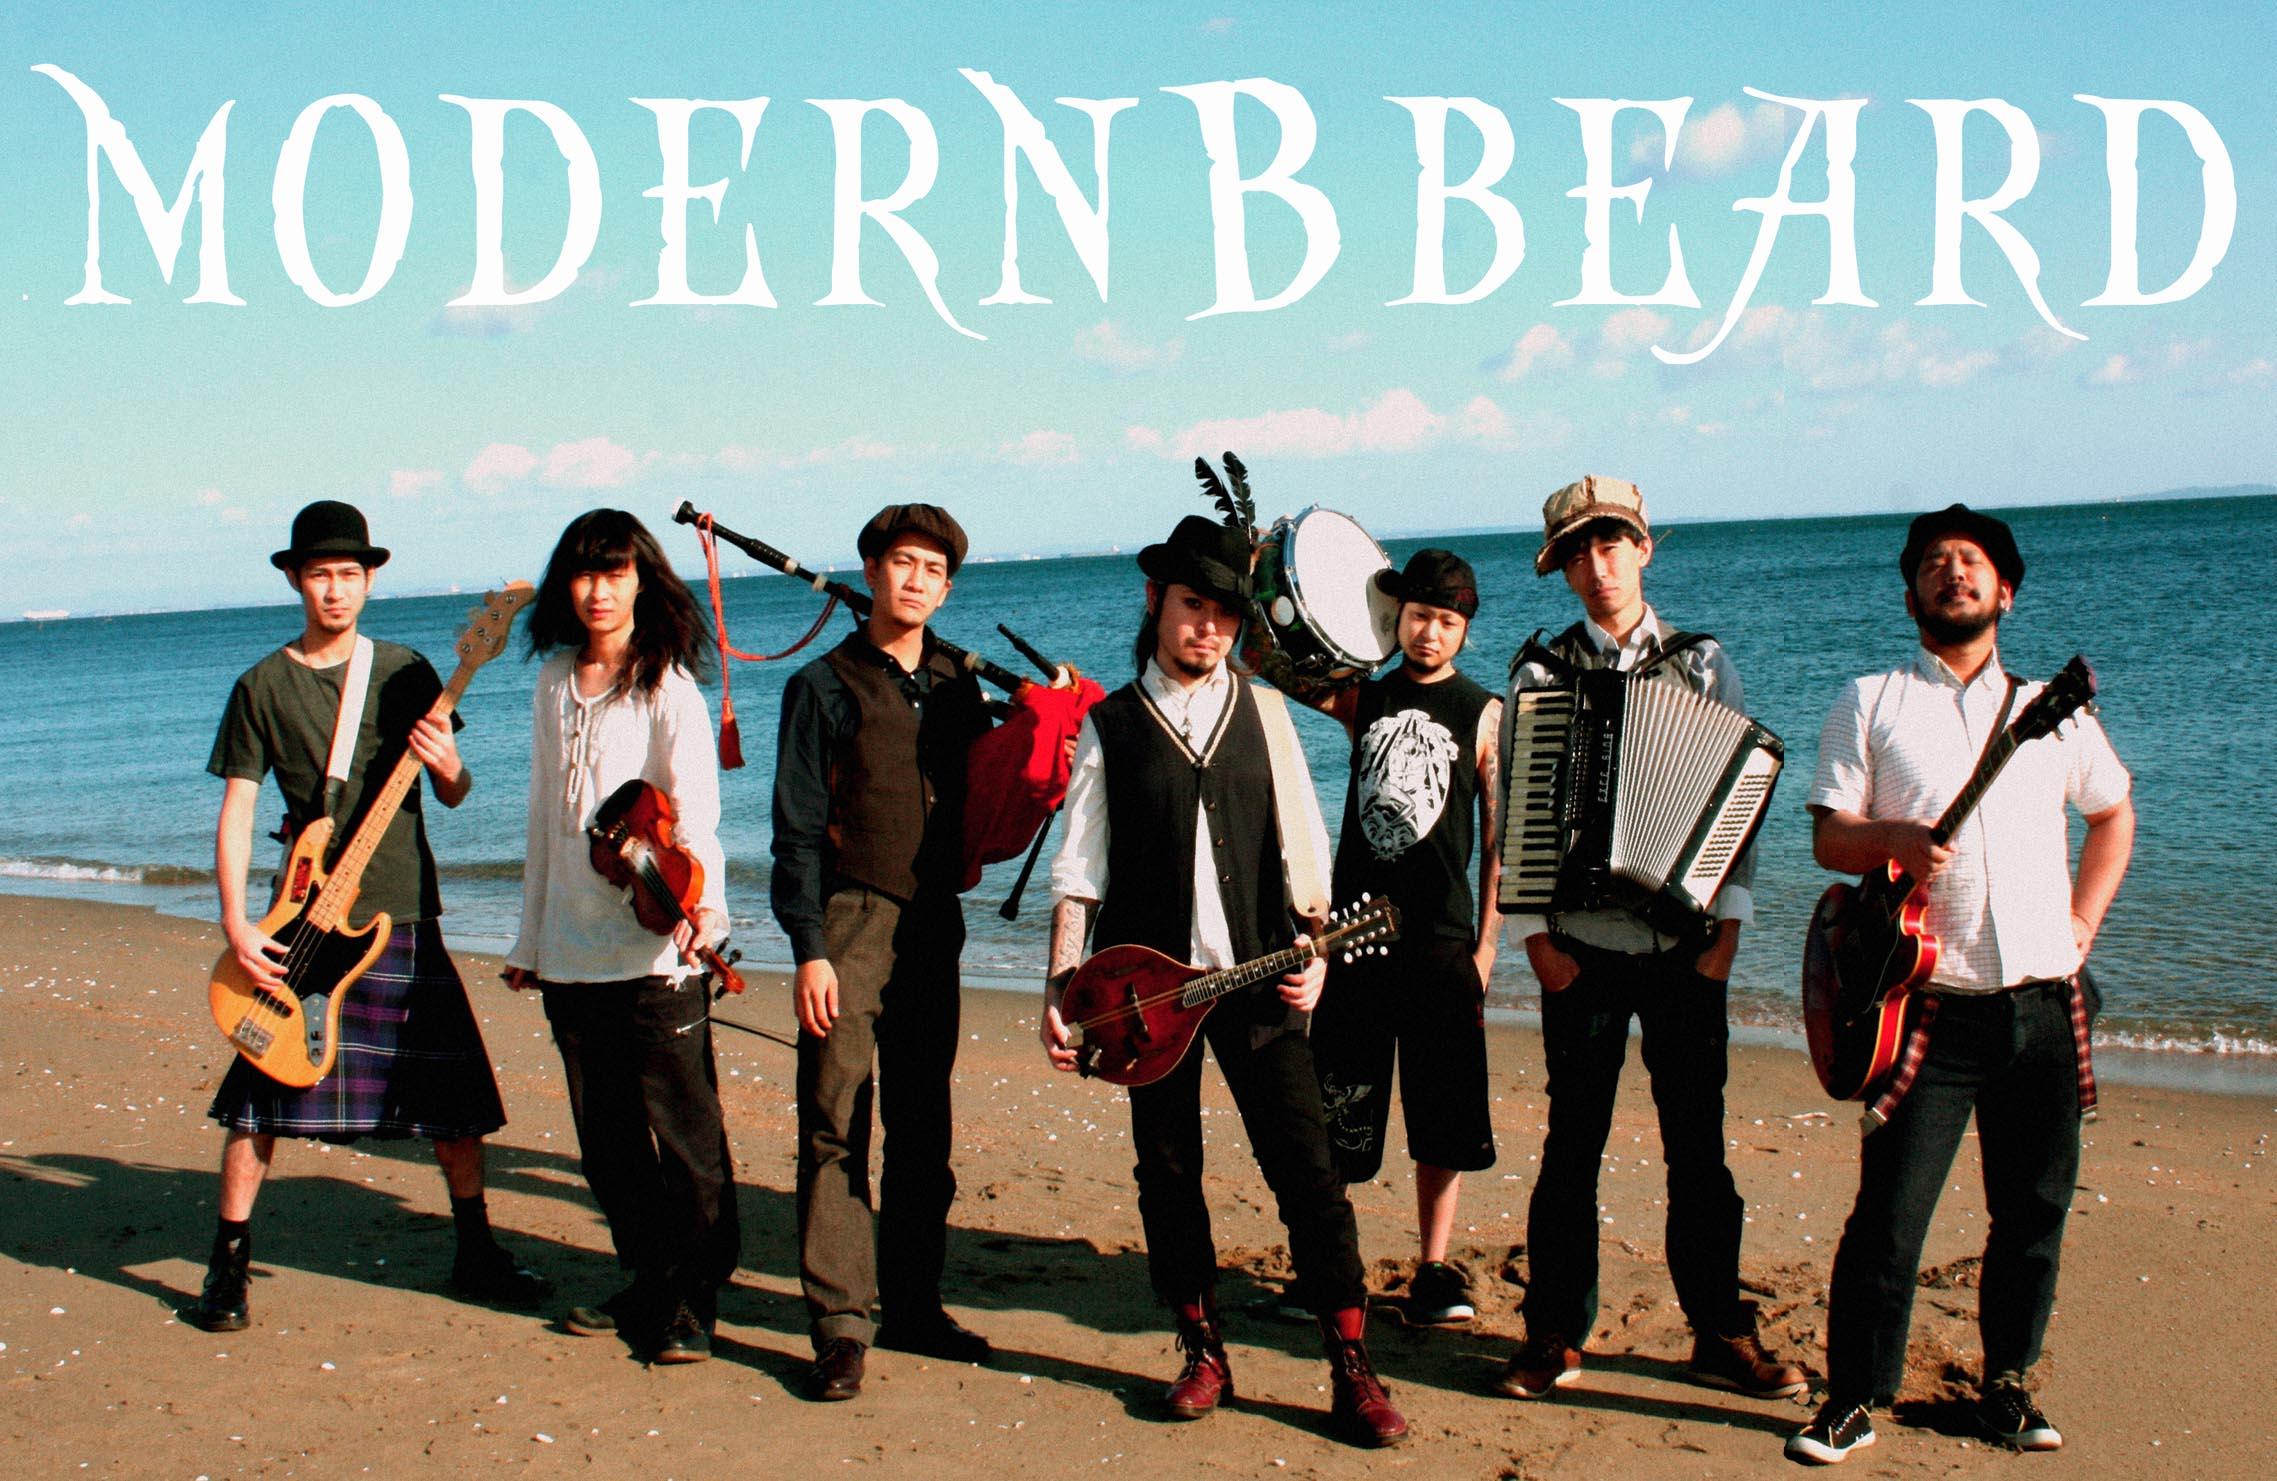 MoDERN B Beard/モダンブラックビアード